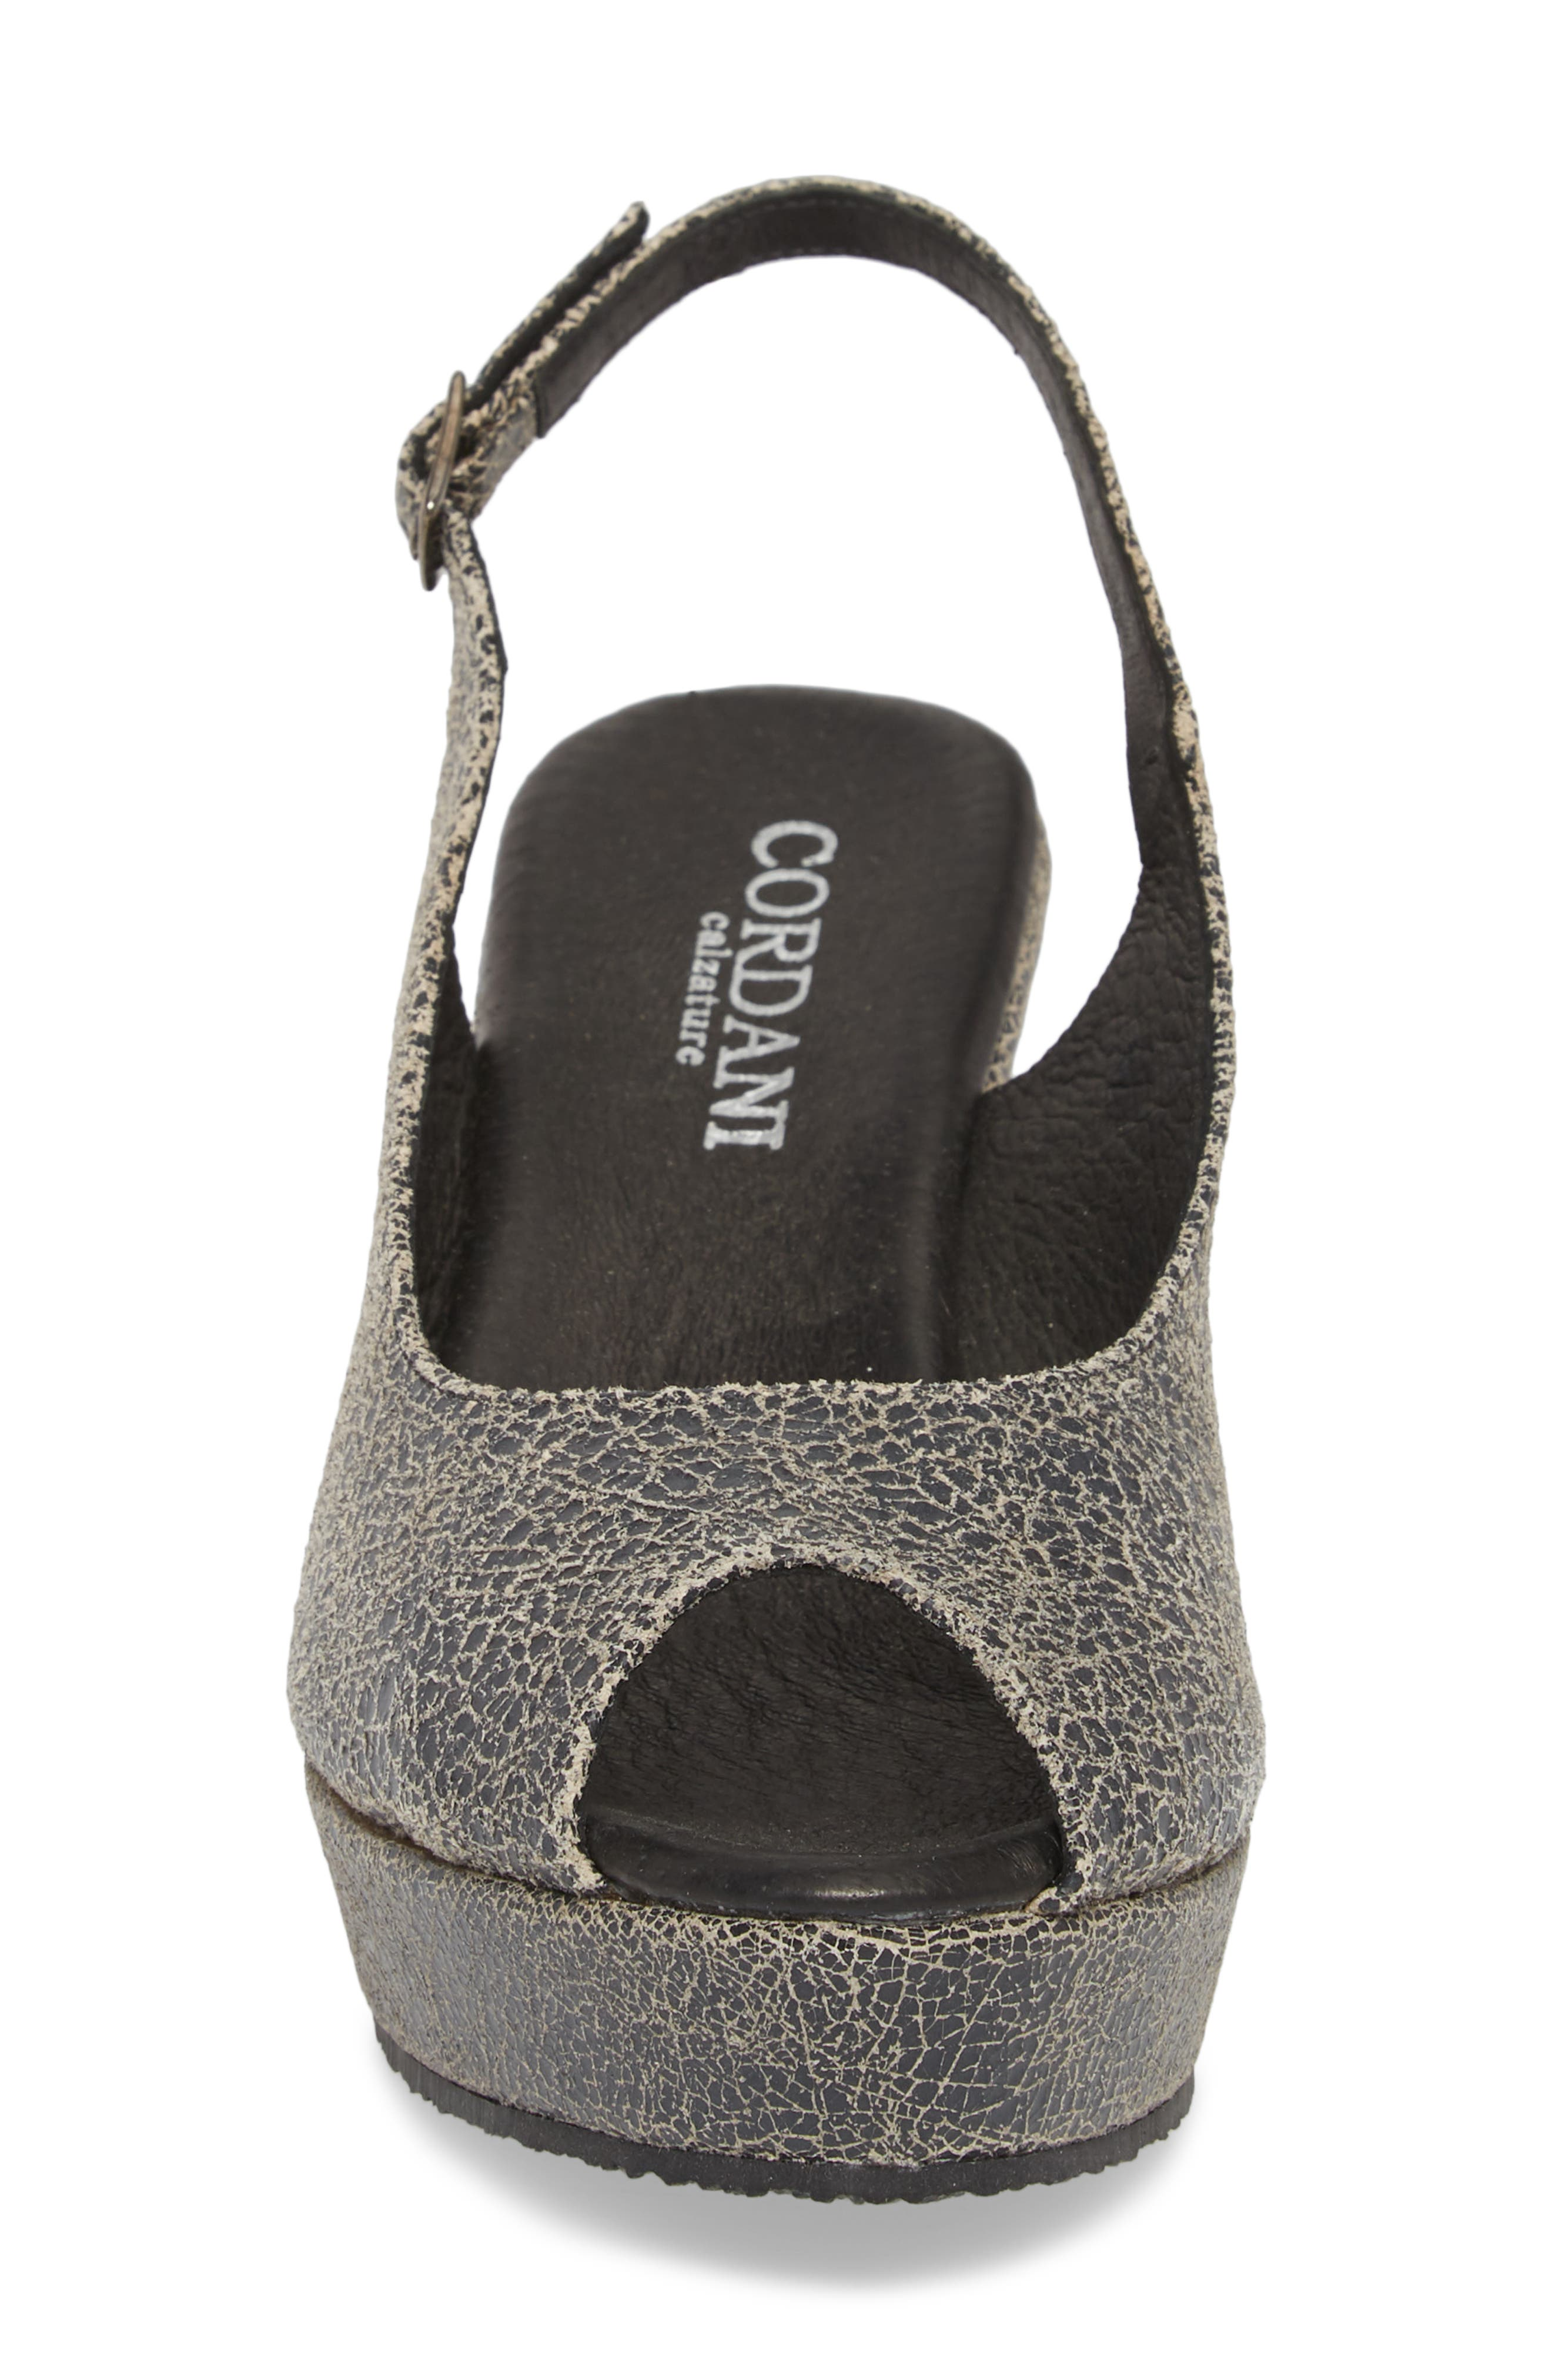 Fabrice Slingback Platform Sandal,                             Alternate thumbnail 4, color,                             Grey Crackle Leather